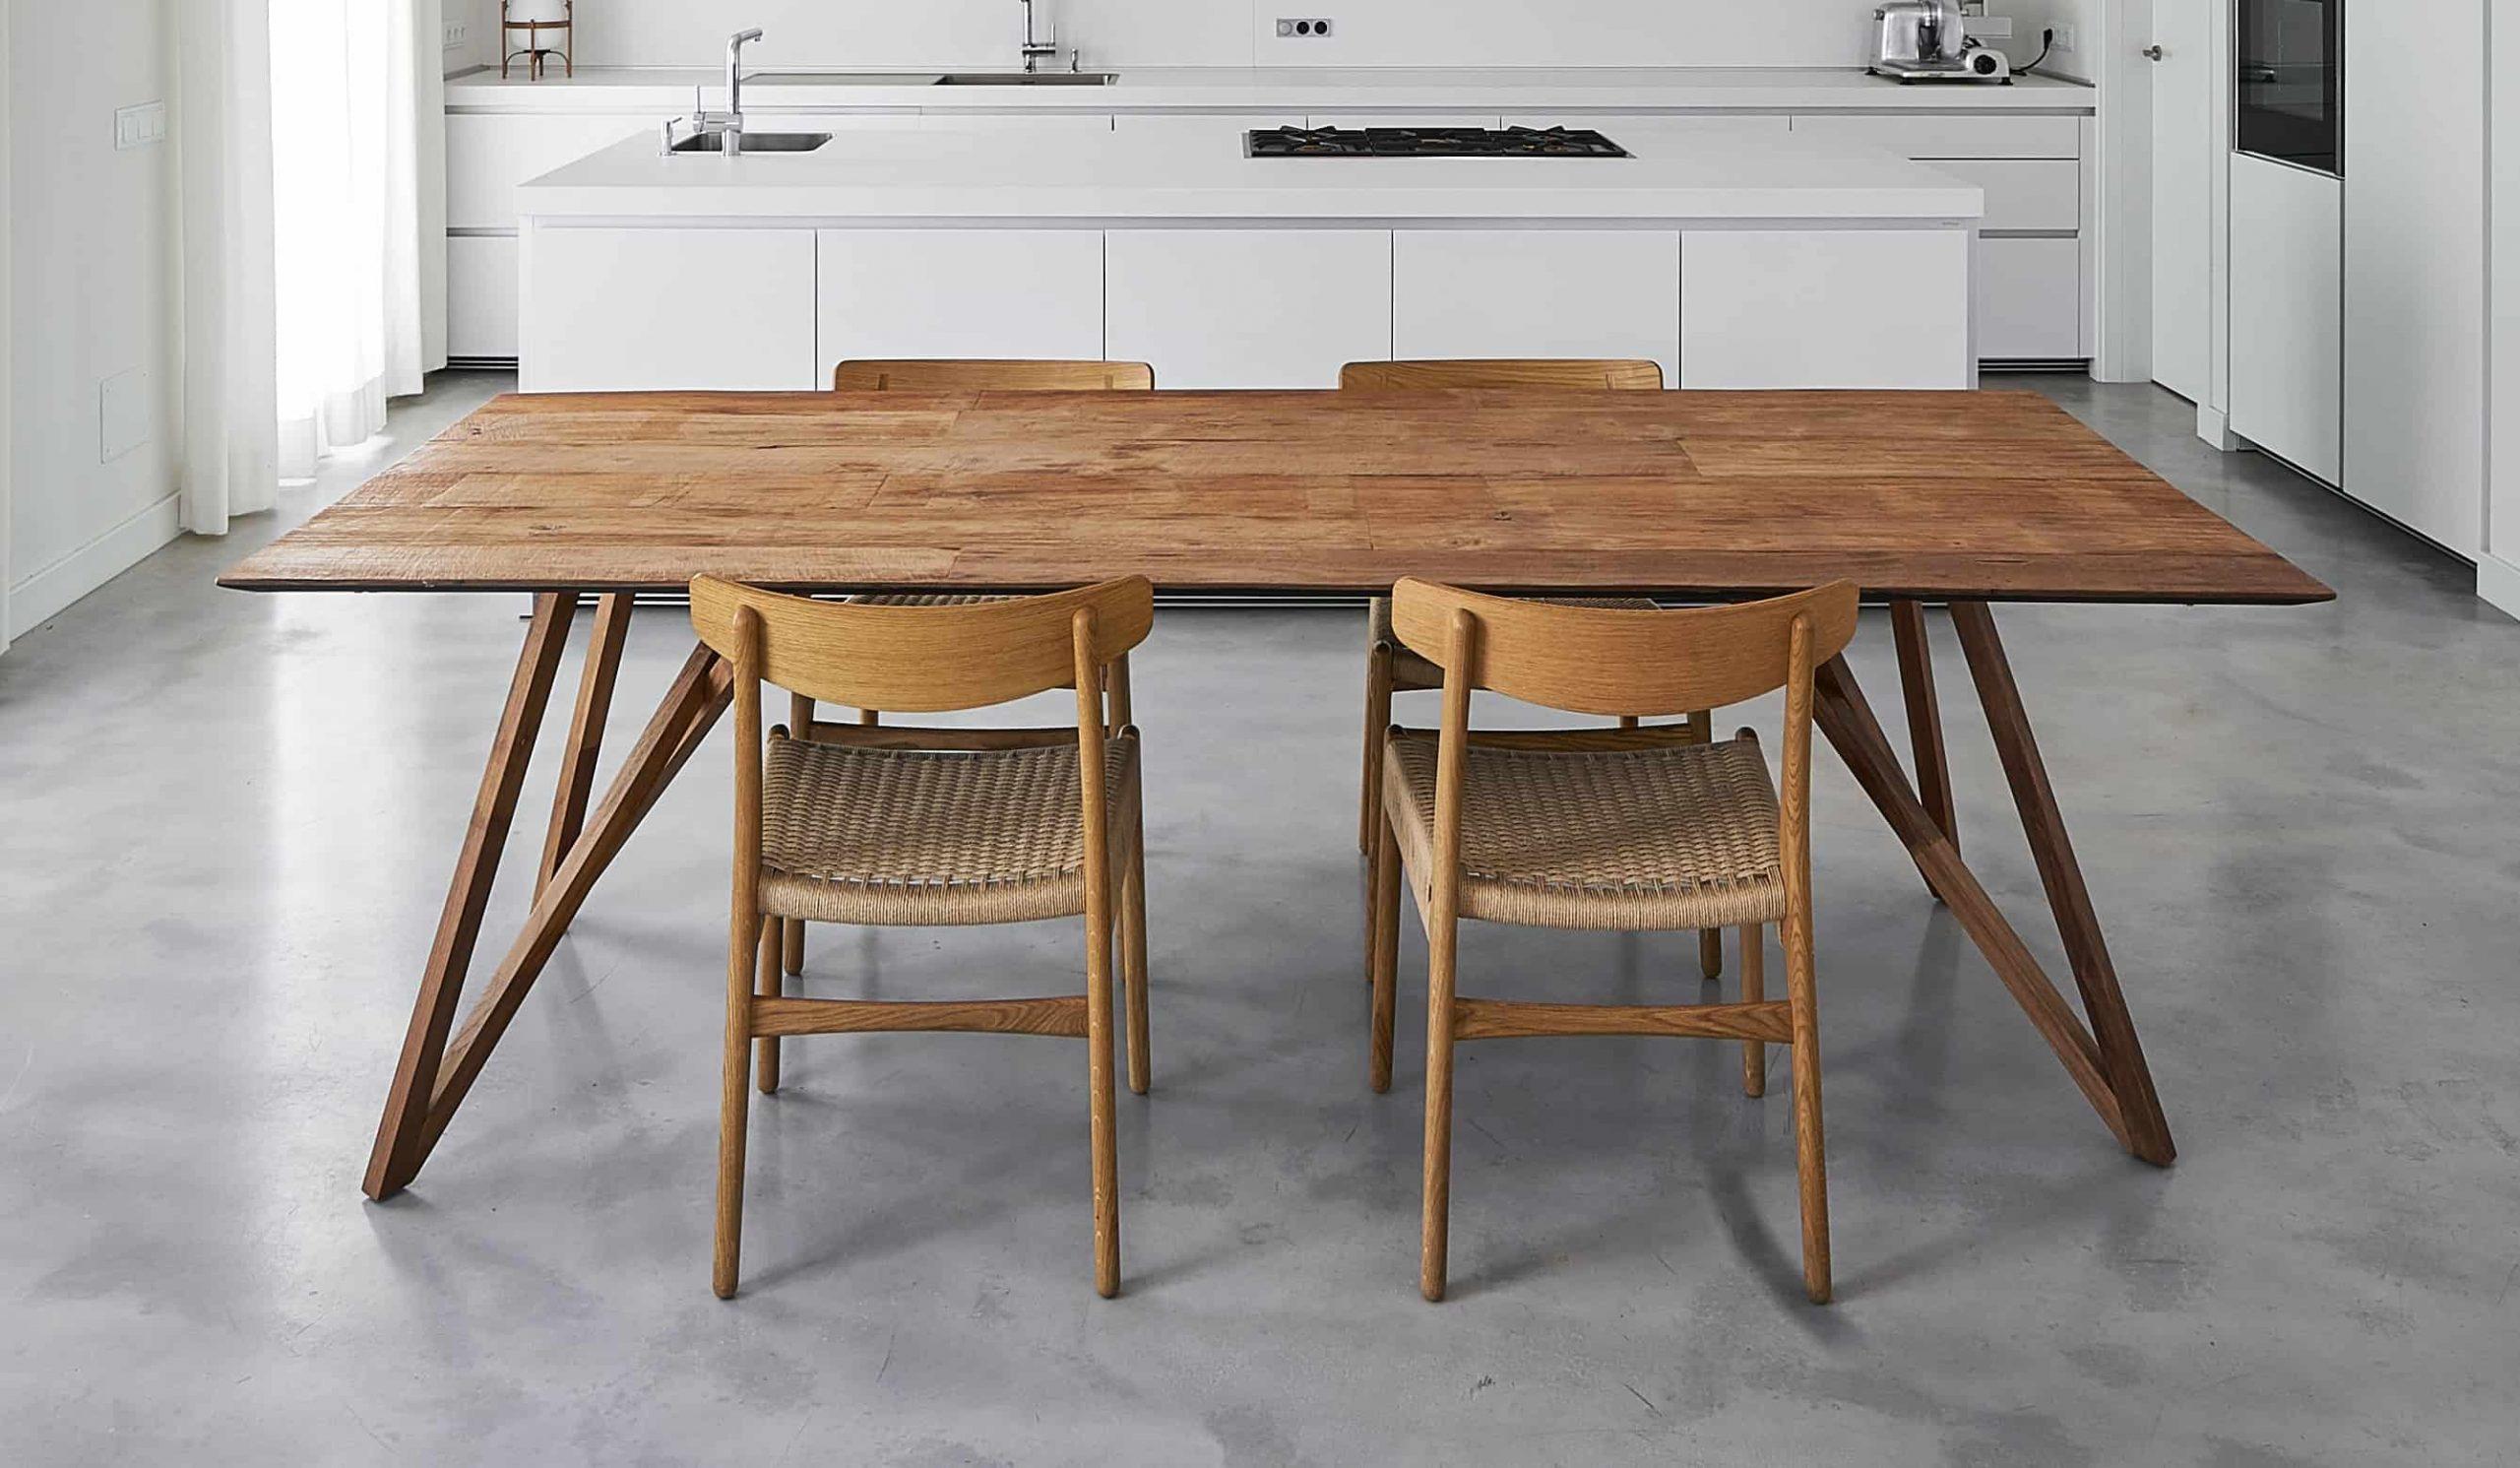 Table Top Polyurethane